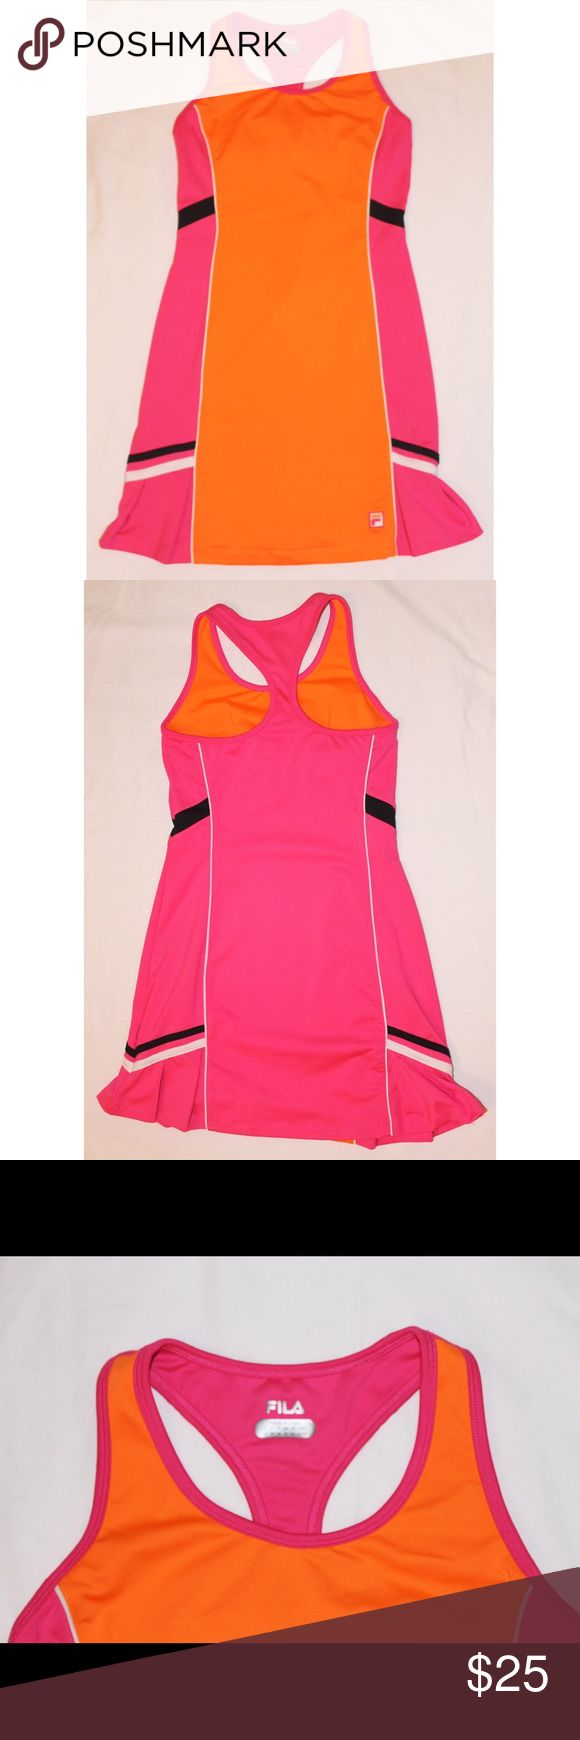 Fila Neon Pink & Orange Racerback Tennis Dress Preowned. Has support bra in the inside. Fila Dresses